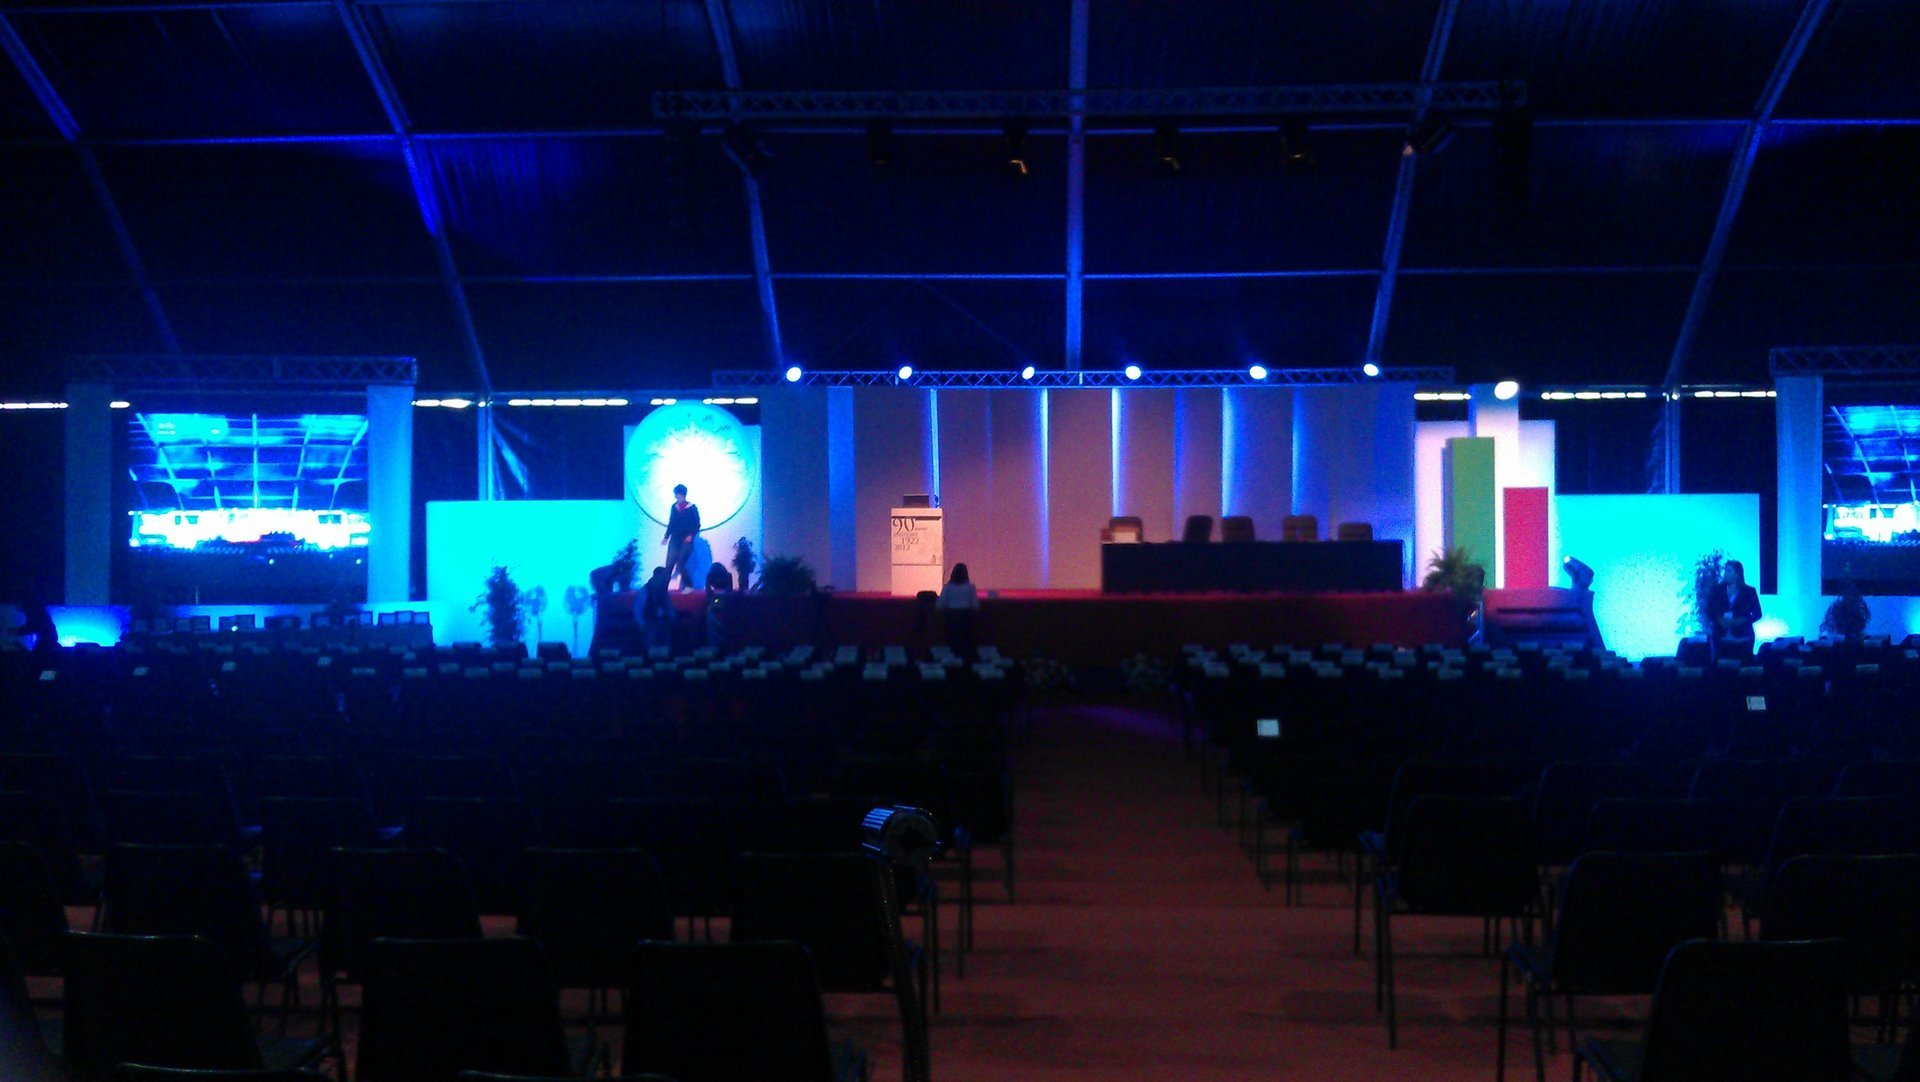 sala meeting con palco illuminato